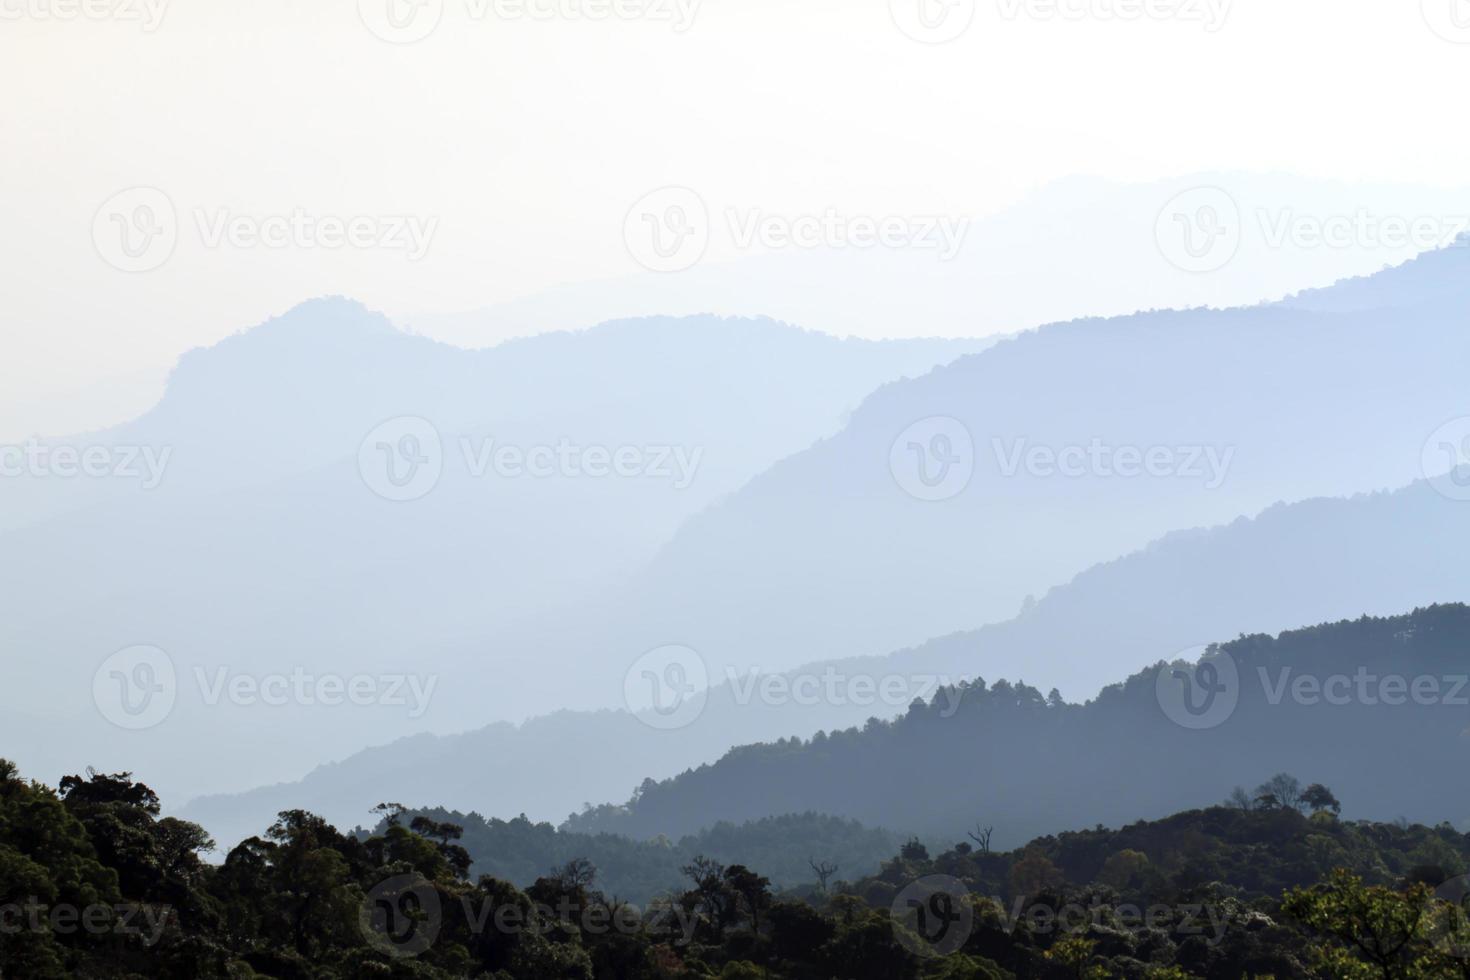 ochtendmist bij tropische bergketen, thailand foto